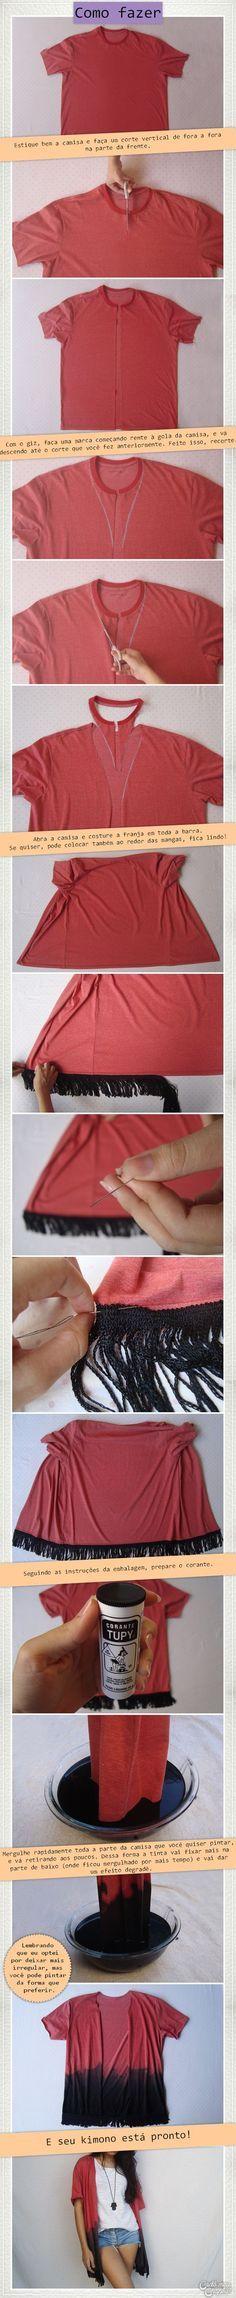 D.I.Y Kimono fashion #cademeuchapeu http://www.cademeuchapeu.com/2014/01/09/d-i-y-kimono-fashion/: